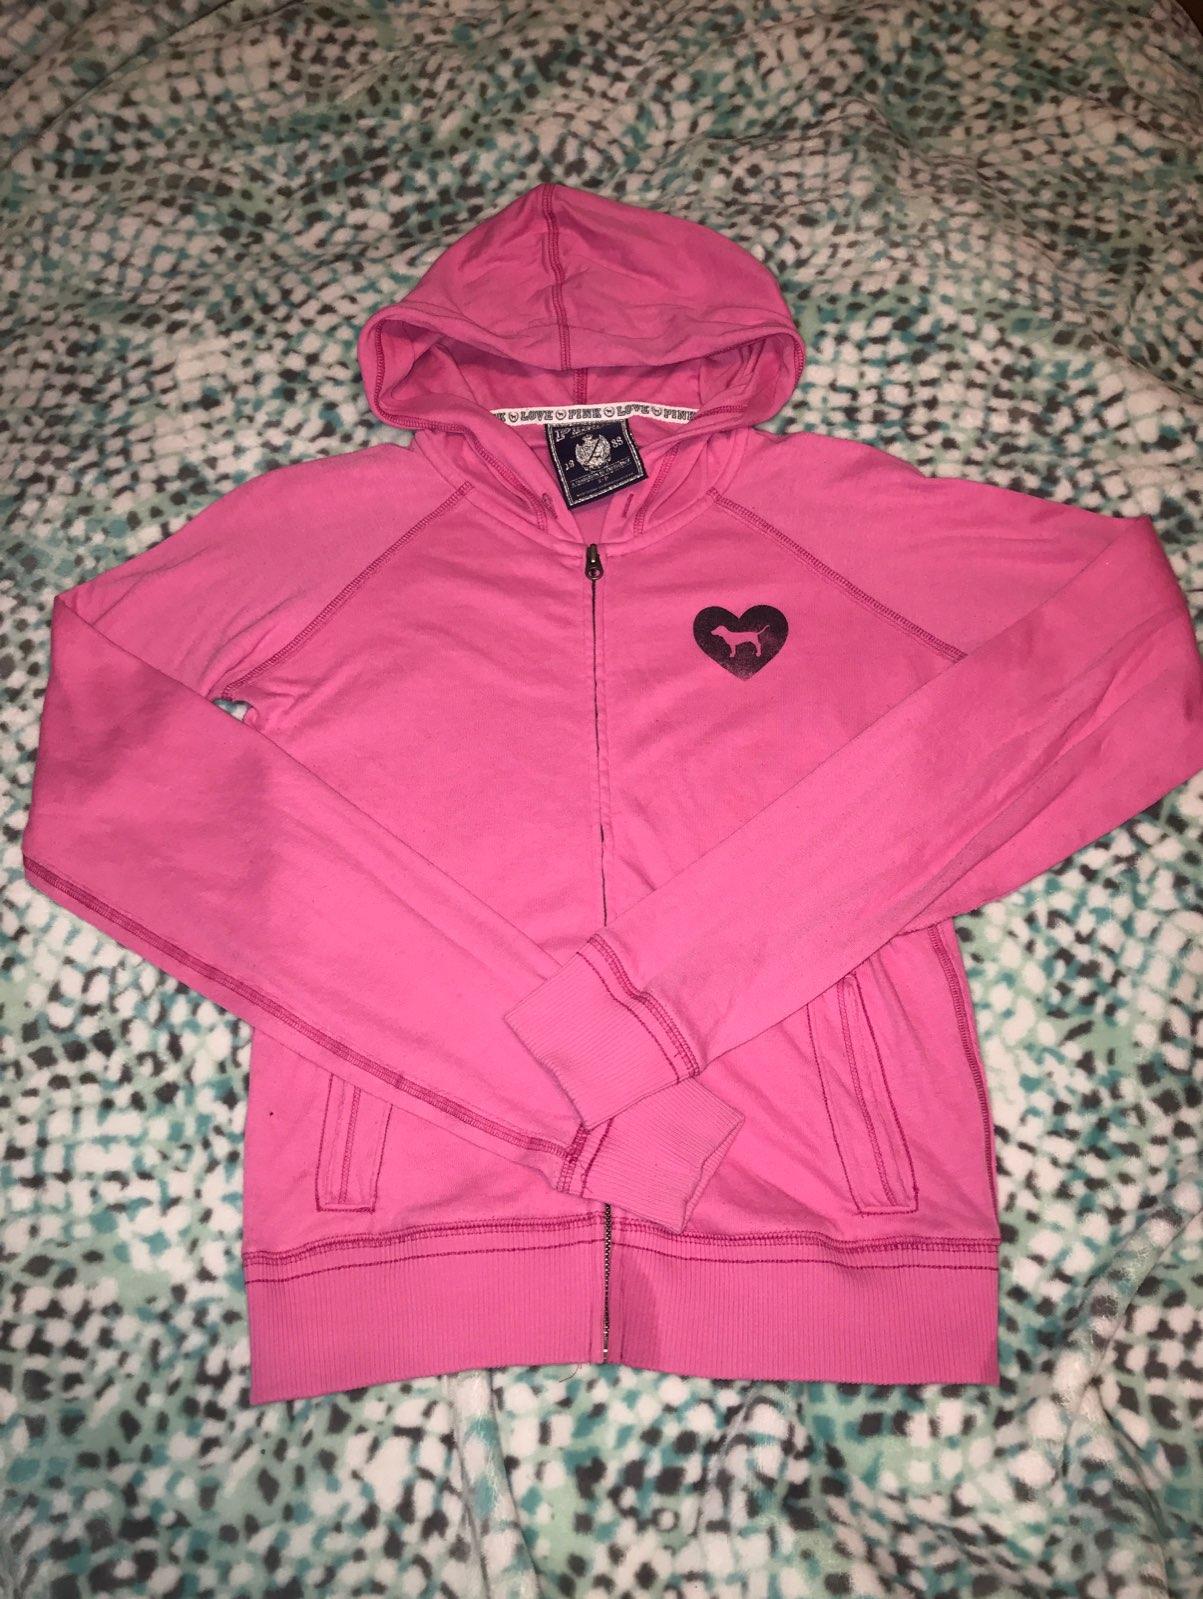 Victoria Secret PINK sweater Full Zip - Mercari: BUY & SELL THINGS ...